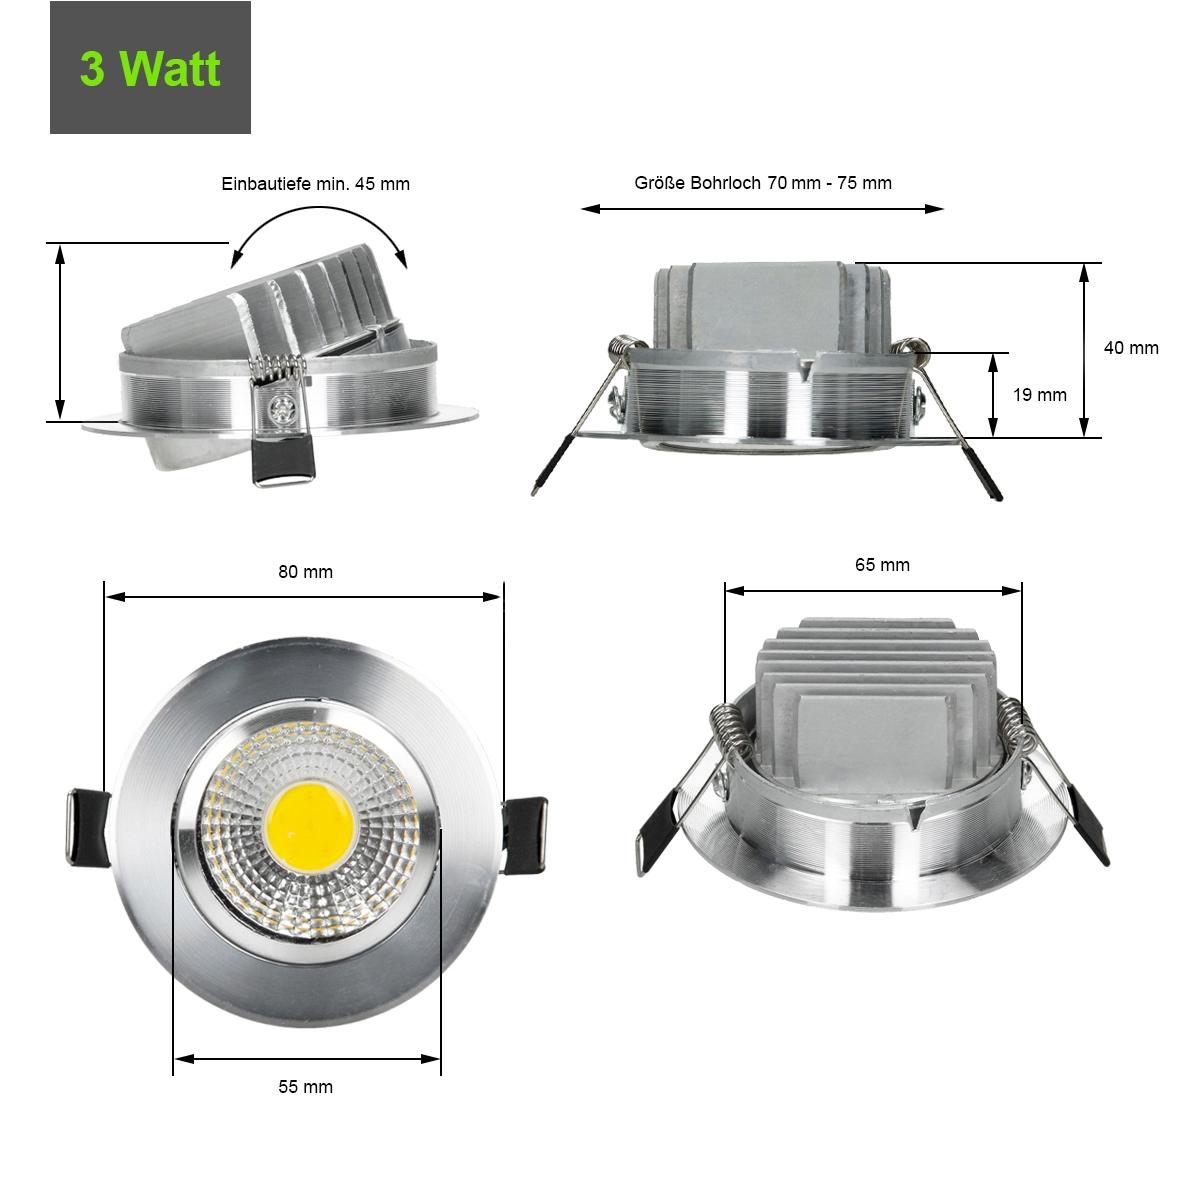 3w 5w 7w 9w 12w led cob einbaustrahler einbauleuchte for Deckenlampe led rund